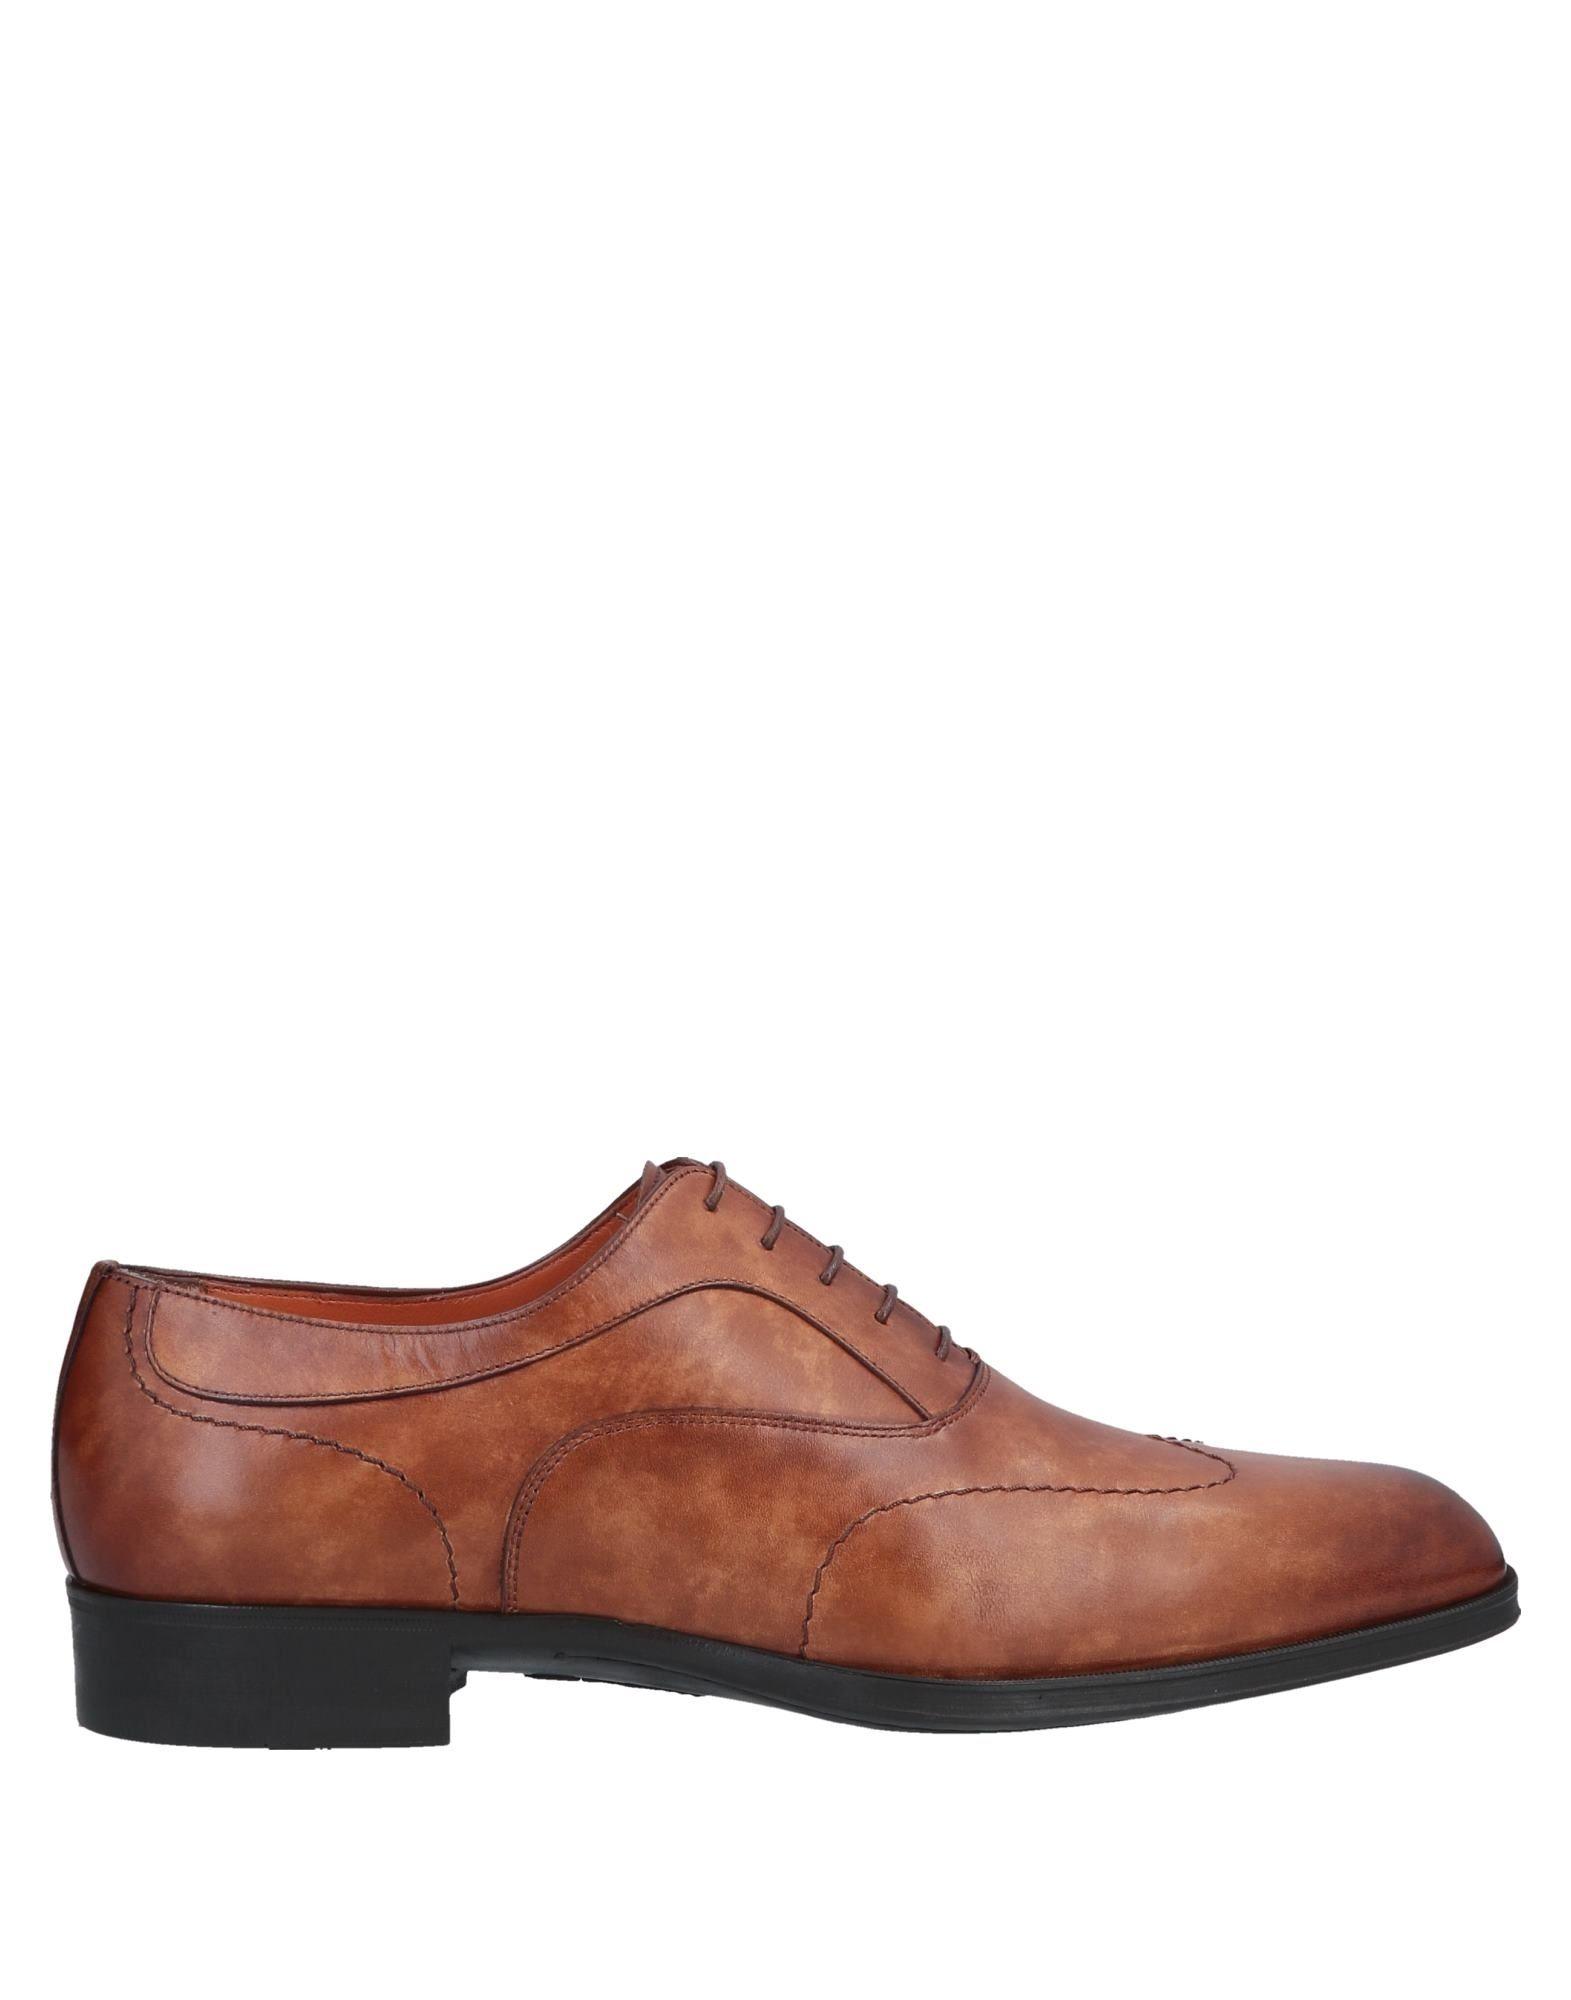 SANTONI Обувь на шнурках santoni обувь на шнурках